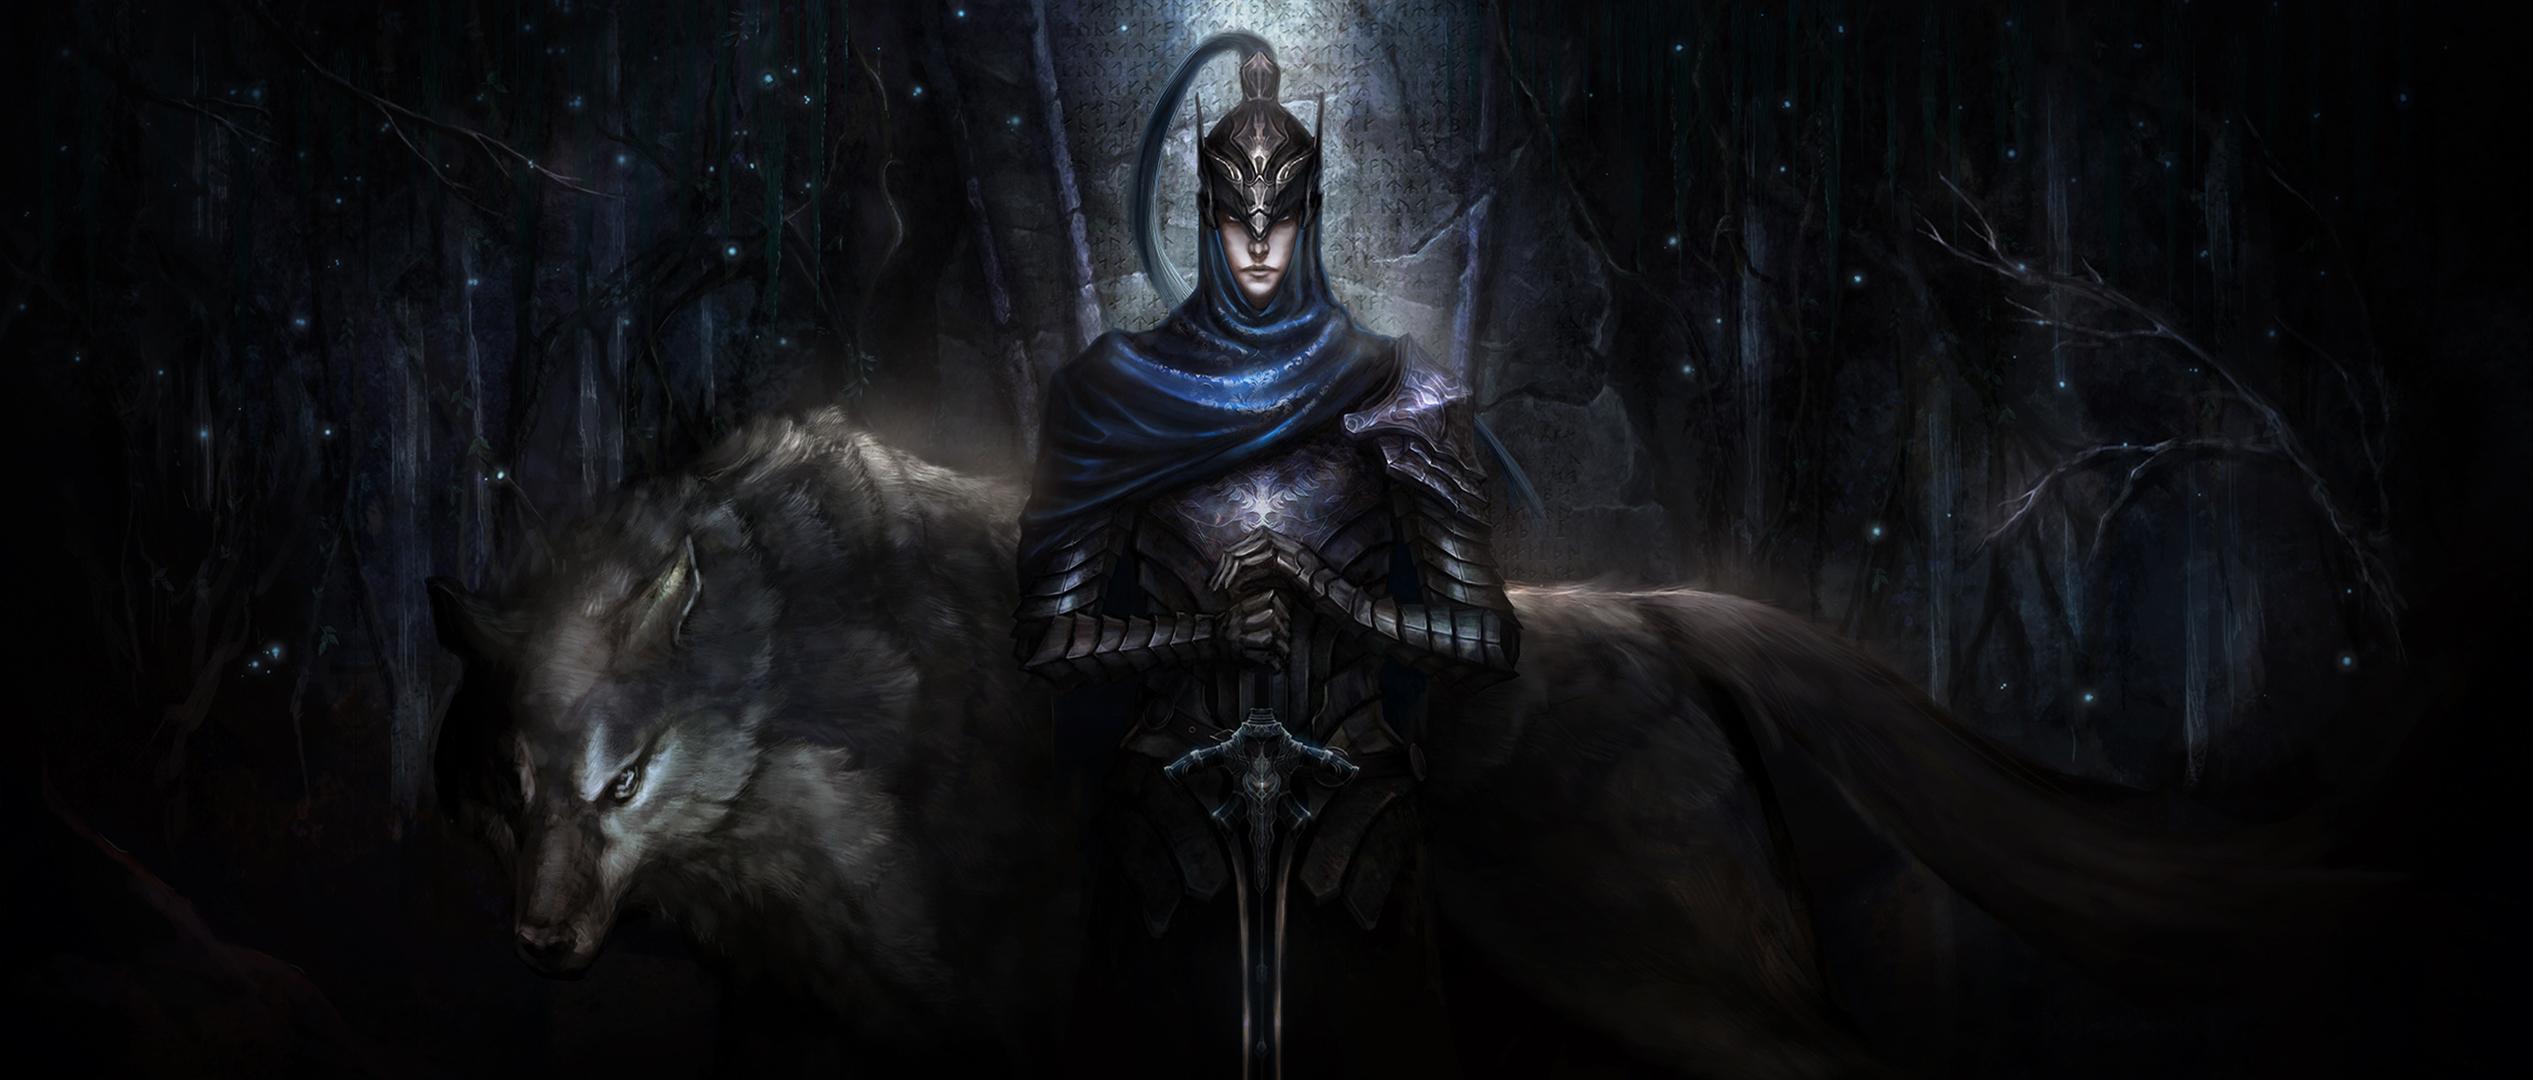 Knight Artorias with wolf standing in the dark hd wallpaper 2533x1080